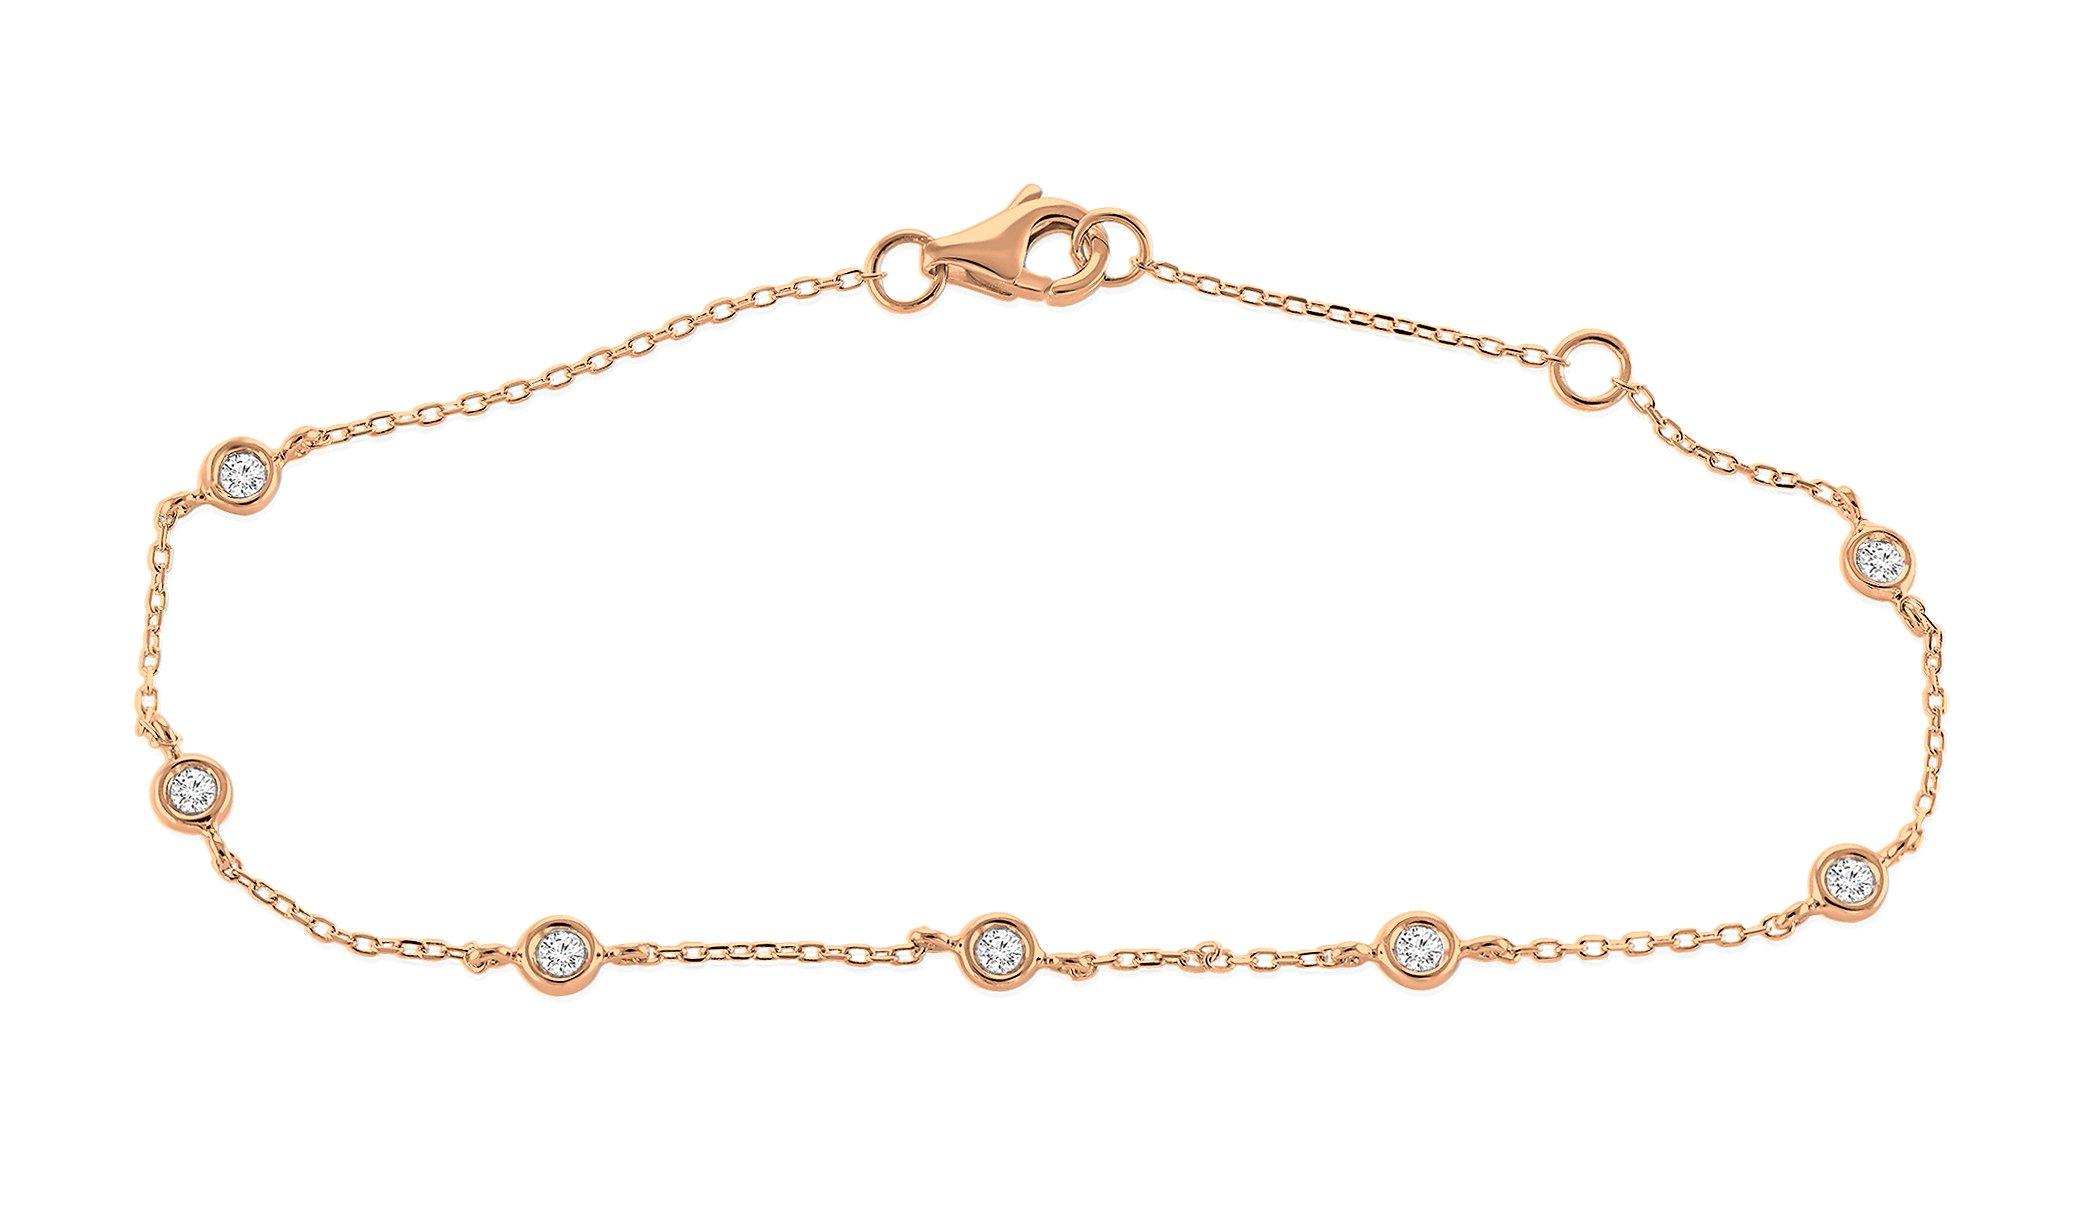 0.15 Ct. 925 Sterling Silver Natural Round Cut White Diamond Ladies Bezel Set Chain Bracelet Adjustable